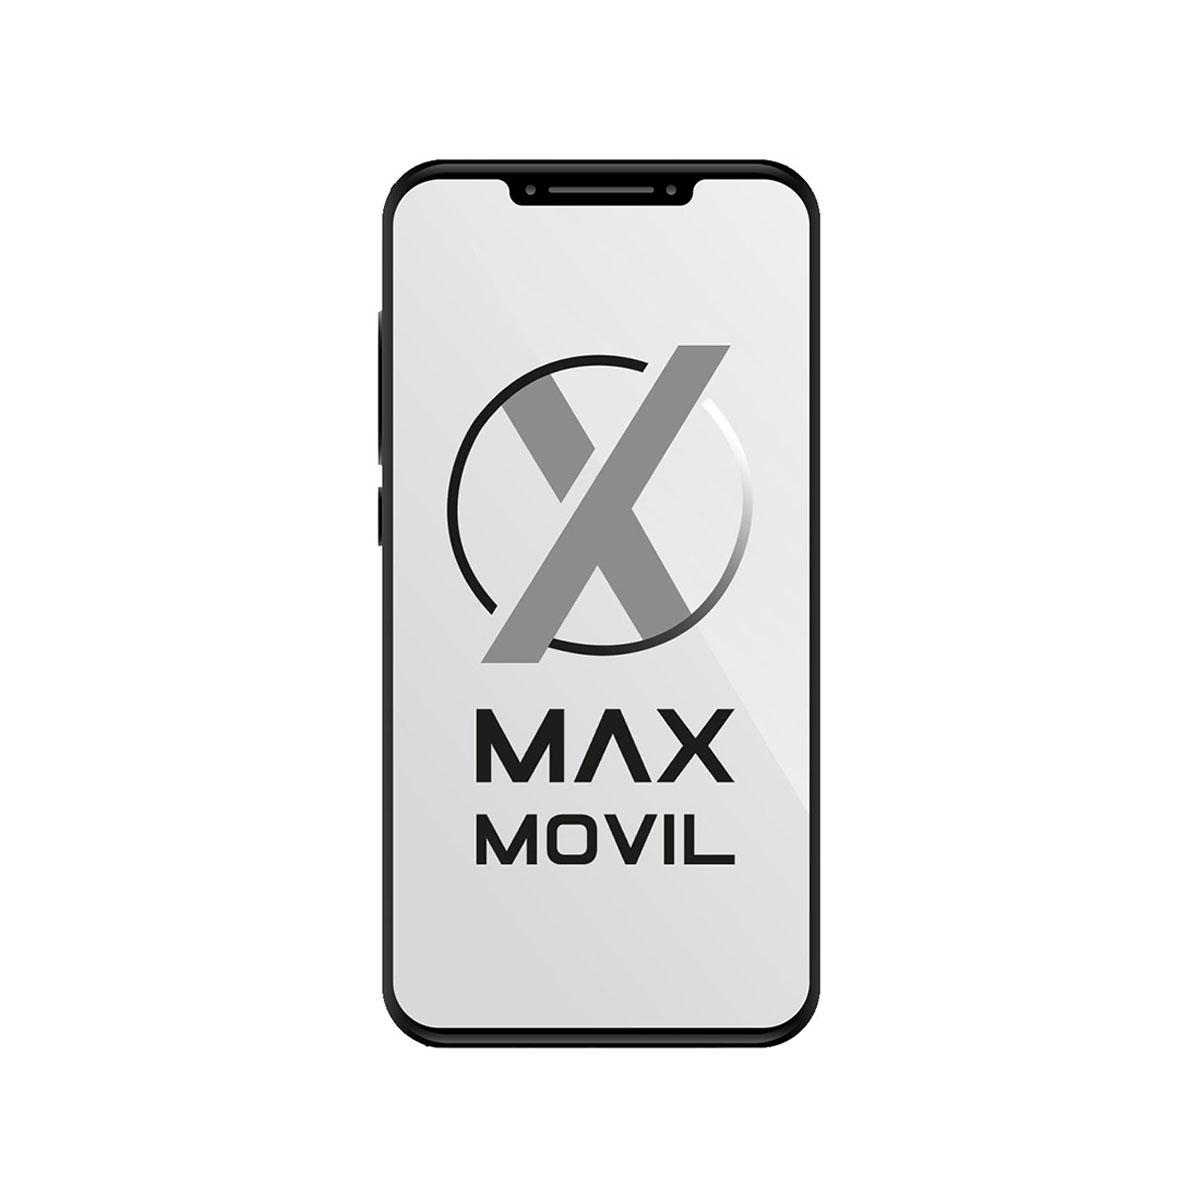 "Libro electronico Energy eReader Max 6"" táctil  Android Wi-Fi 8GB"